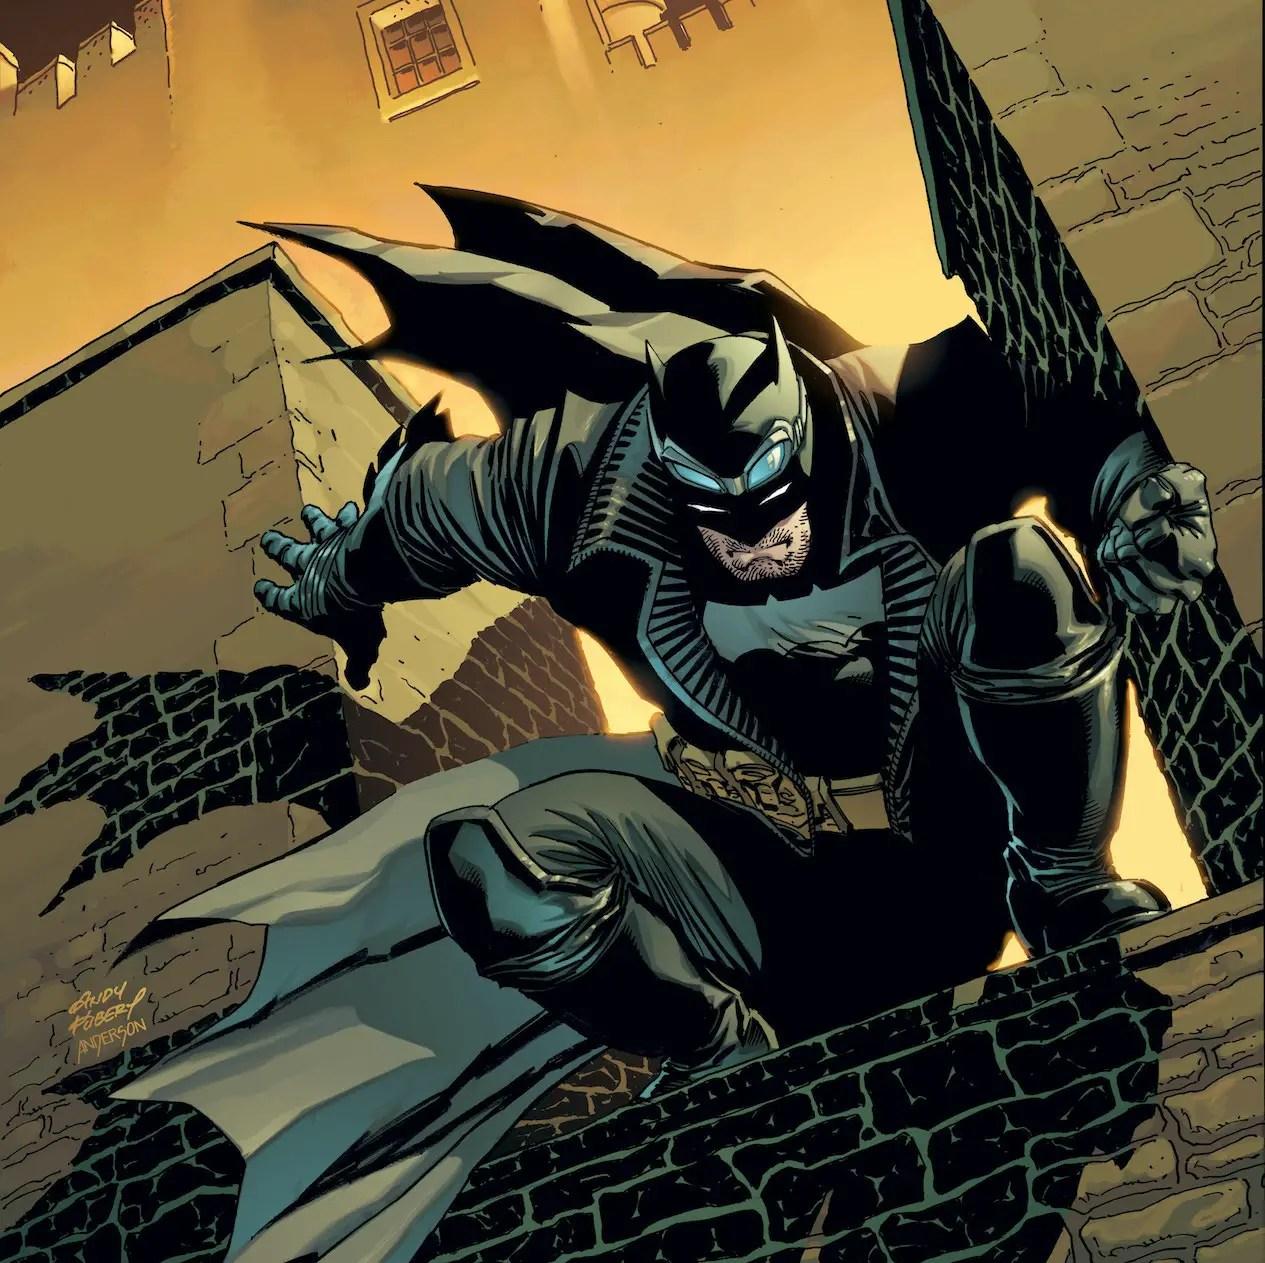 'Batman: The Detective' #1 makes a case to be your favorite bat-book